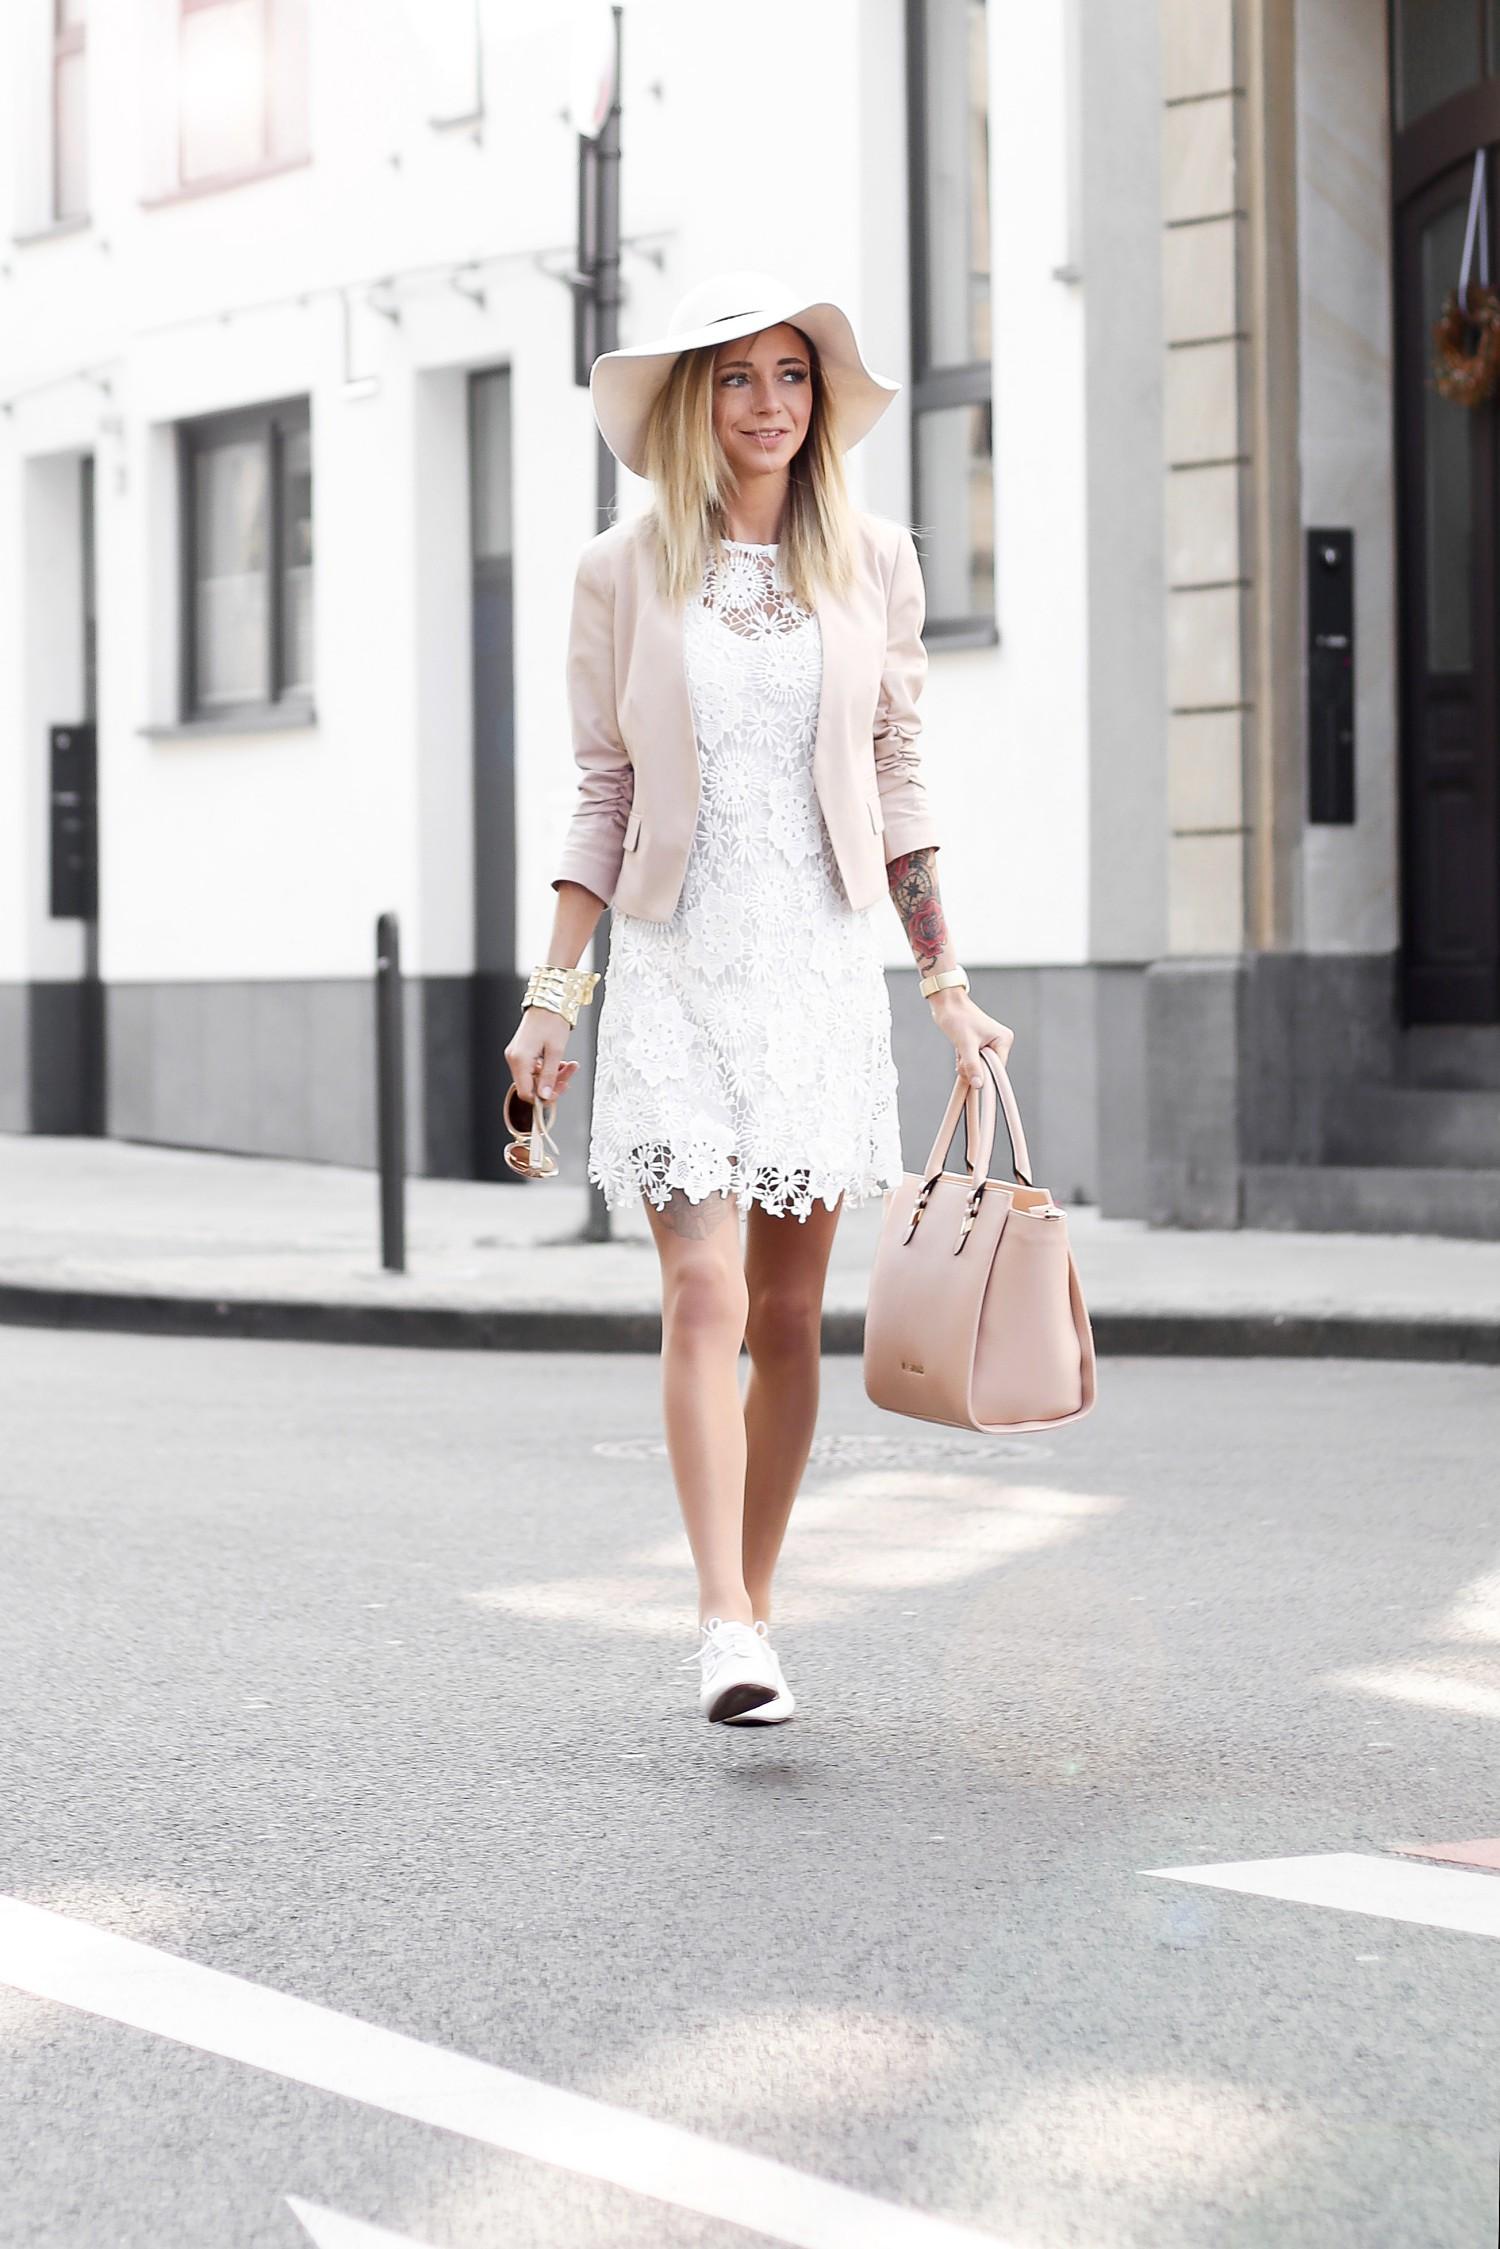 fashionblog-koeln-minamia-outfit-orsay-valentino-172